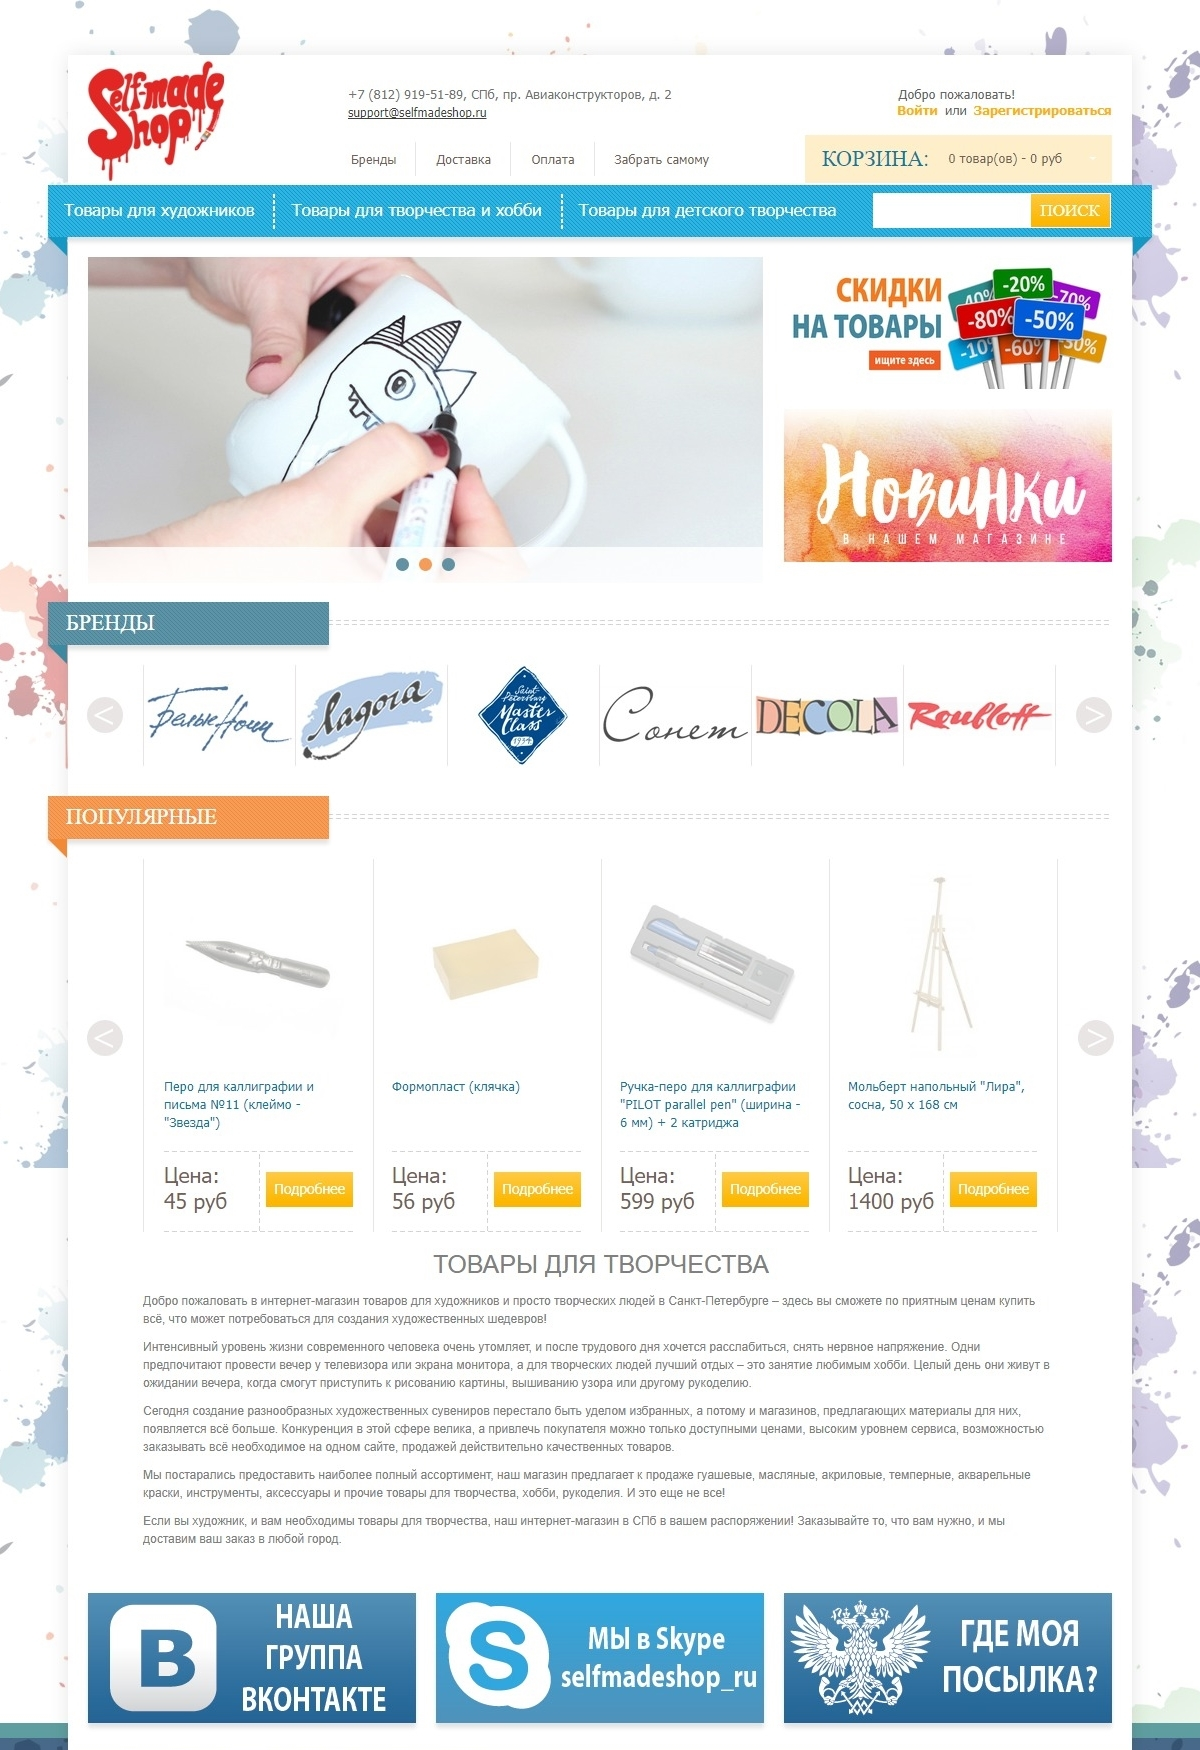 selfmadeshop.ru